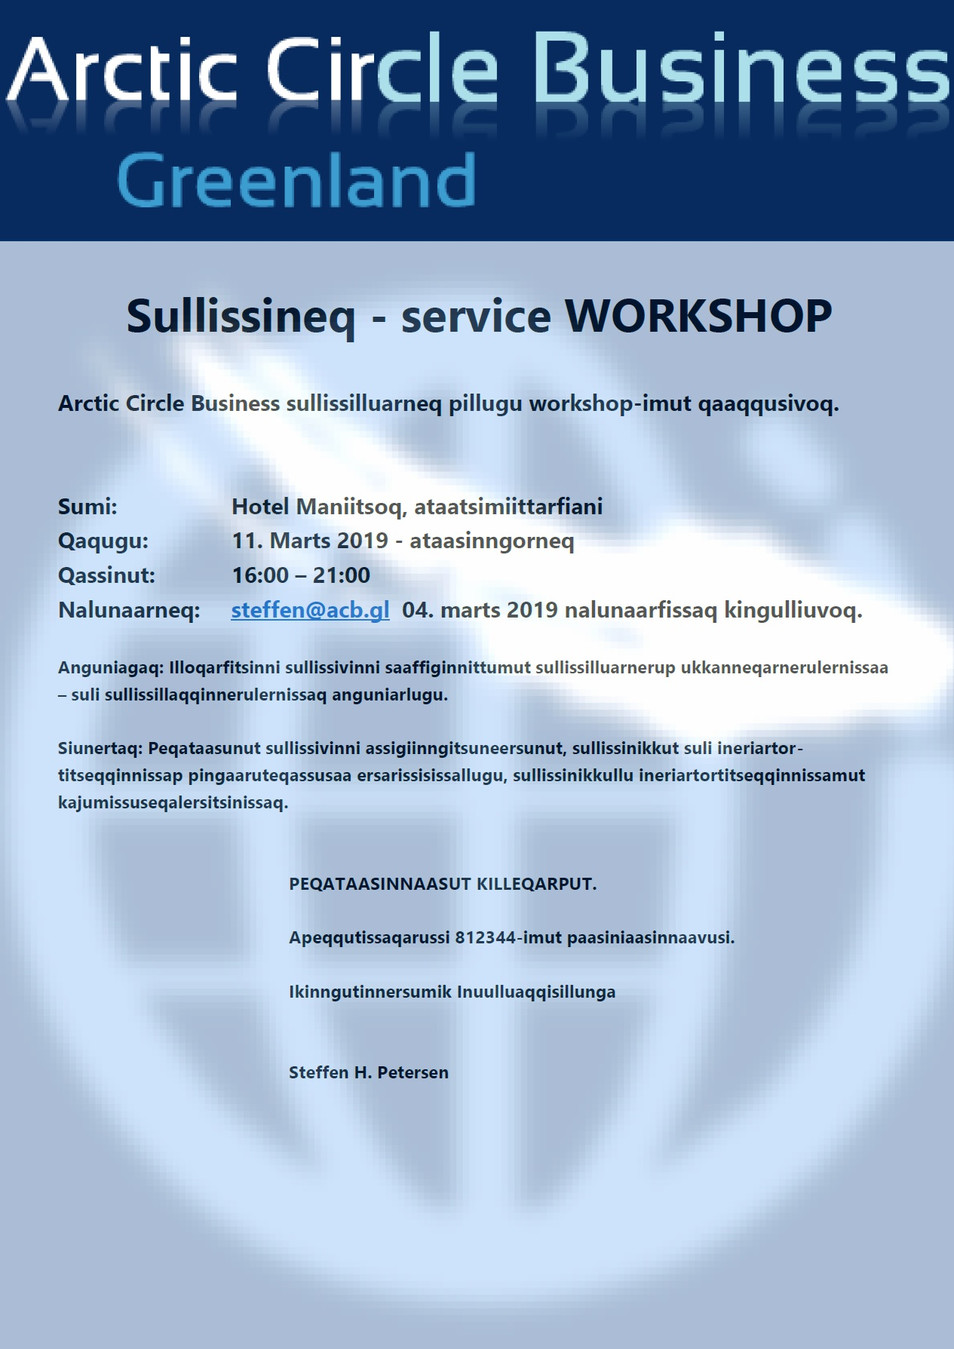 Sullissineq - service WORKSHOP Maniitsumi